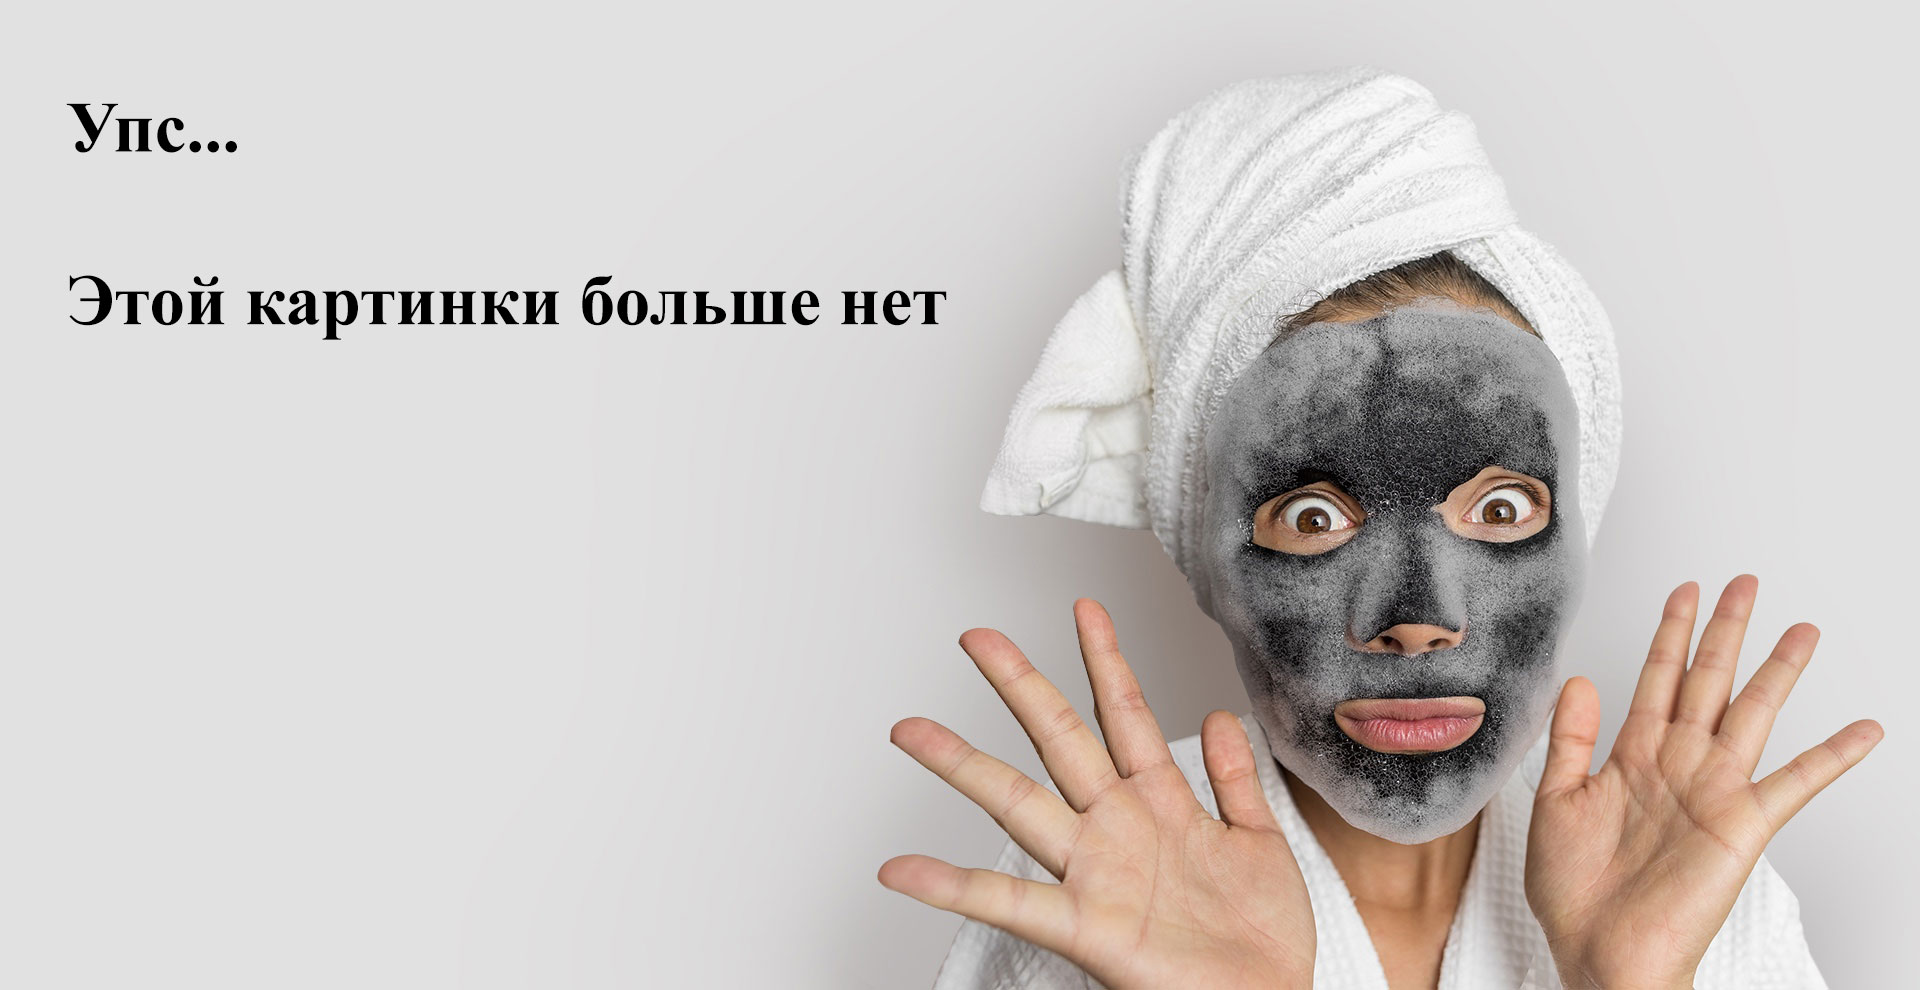 Igrobeauty, Полоски для депиляции розовые, 7x22